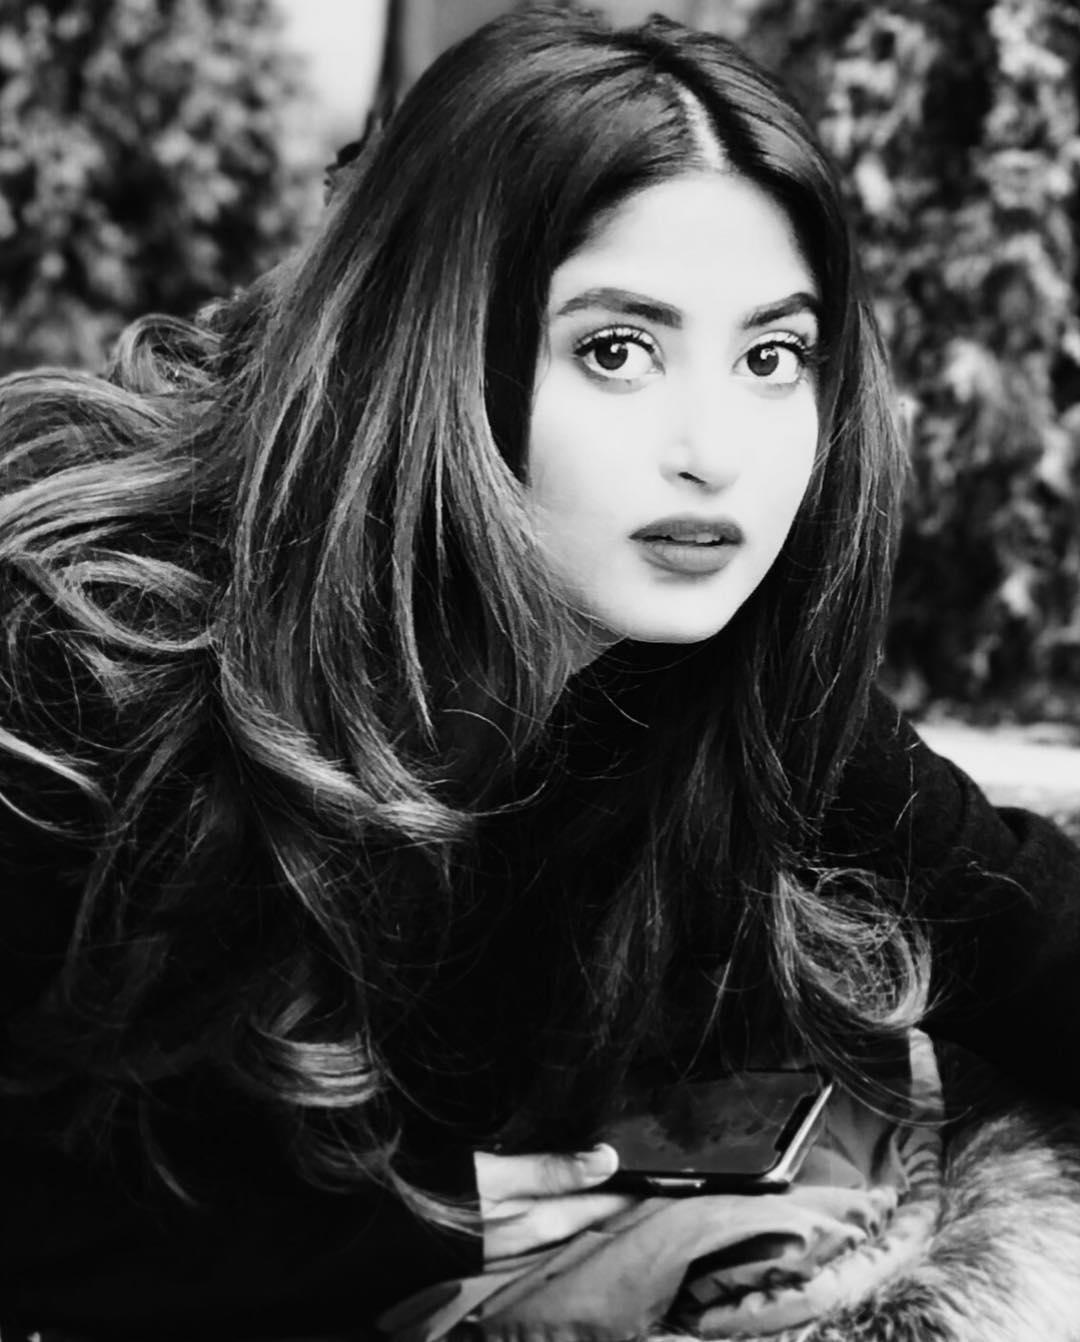 Bollywood Tadka,सजल अली इमेज,सजल अली फोटो,सजल अली पिक्चर,